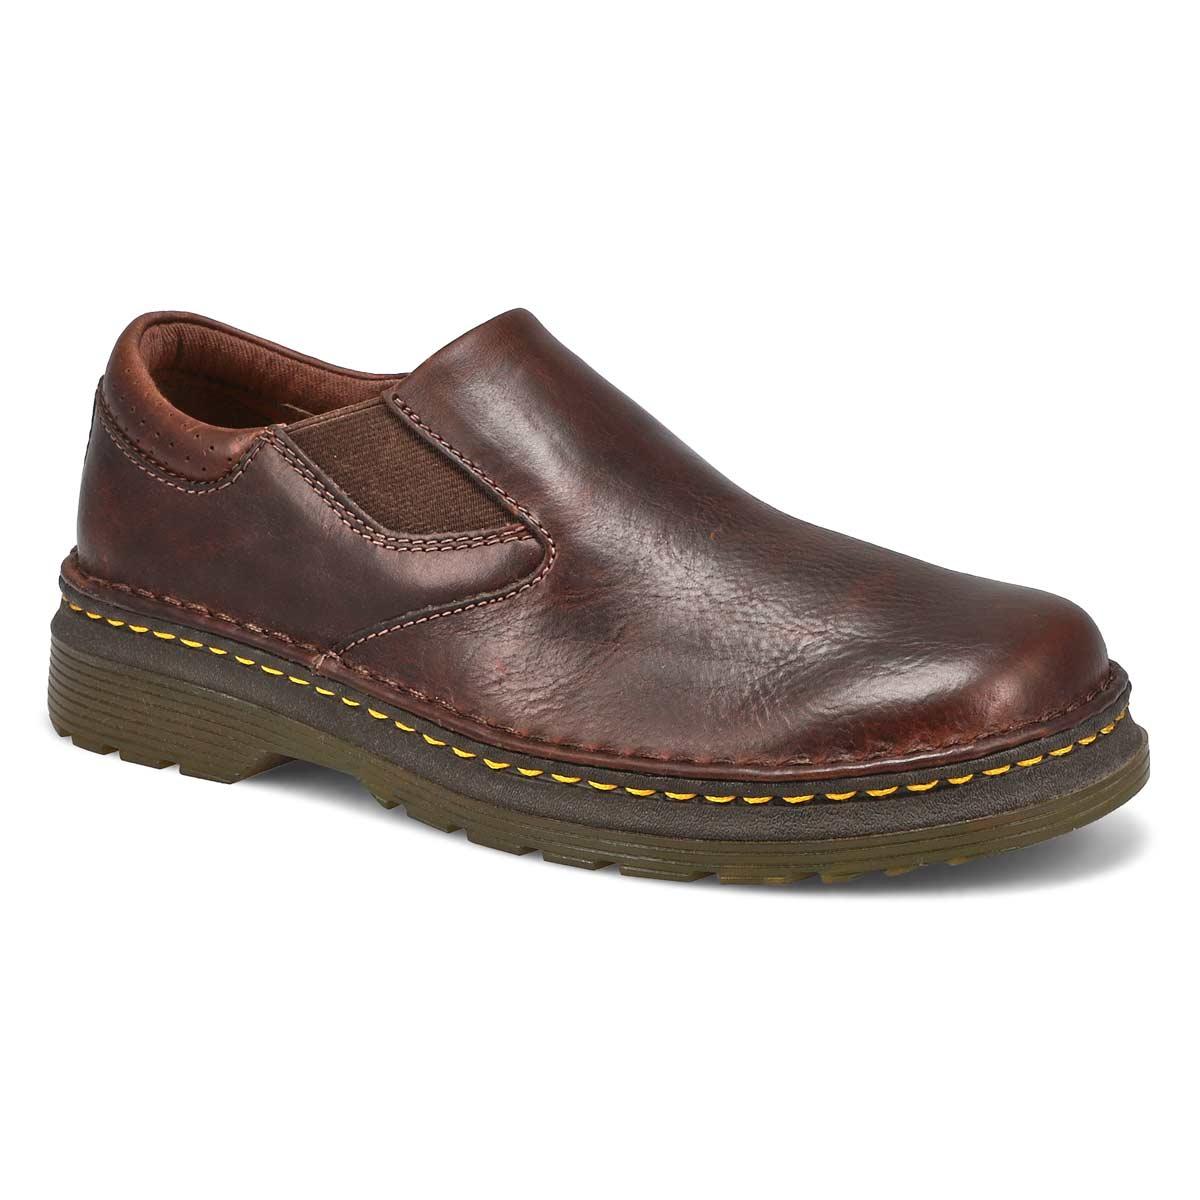 Mns Orson dk brown plain toe slip on